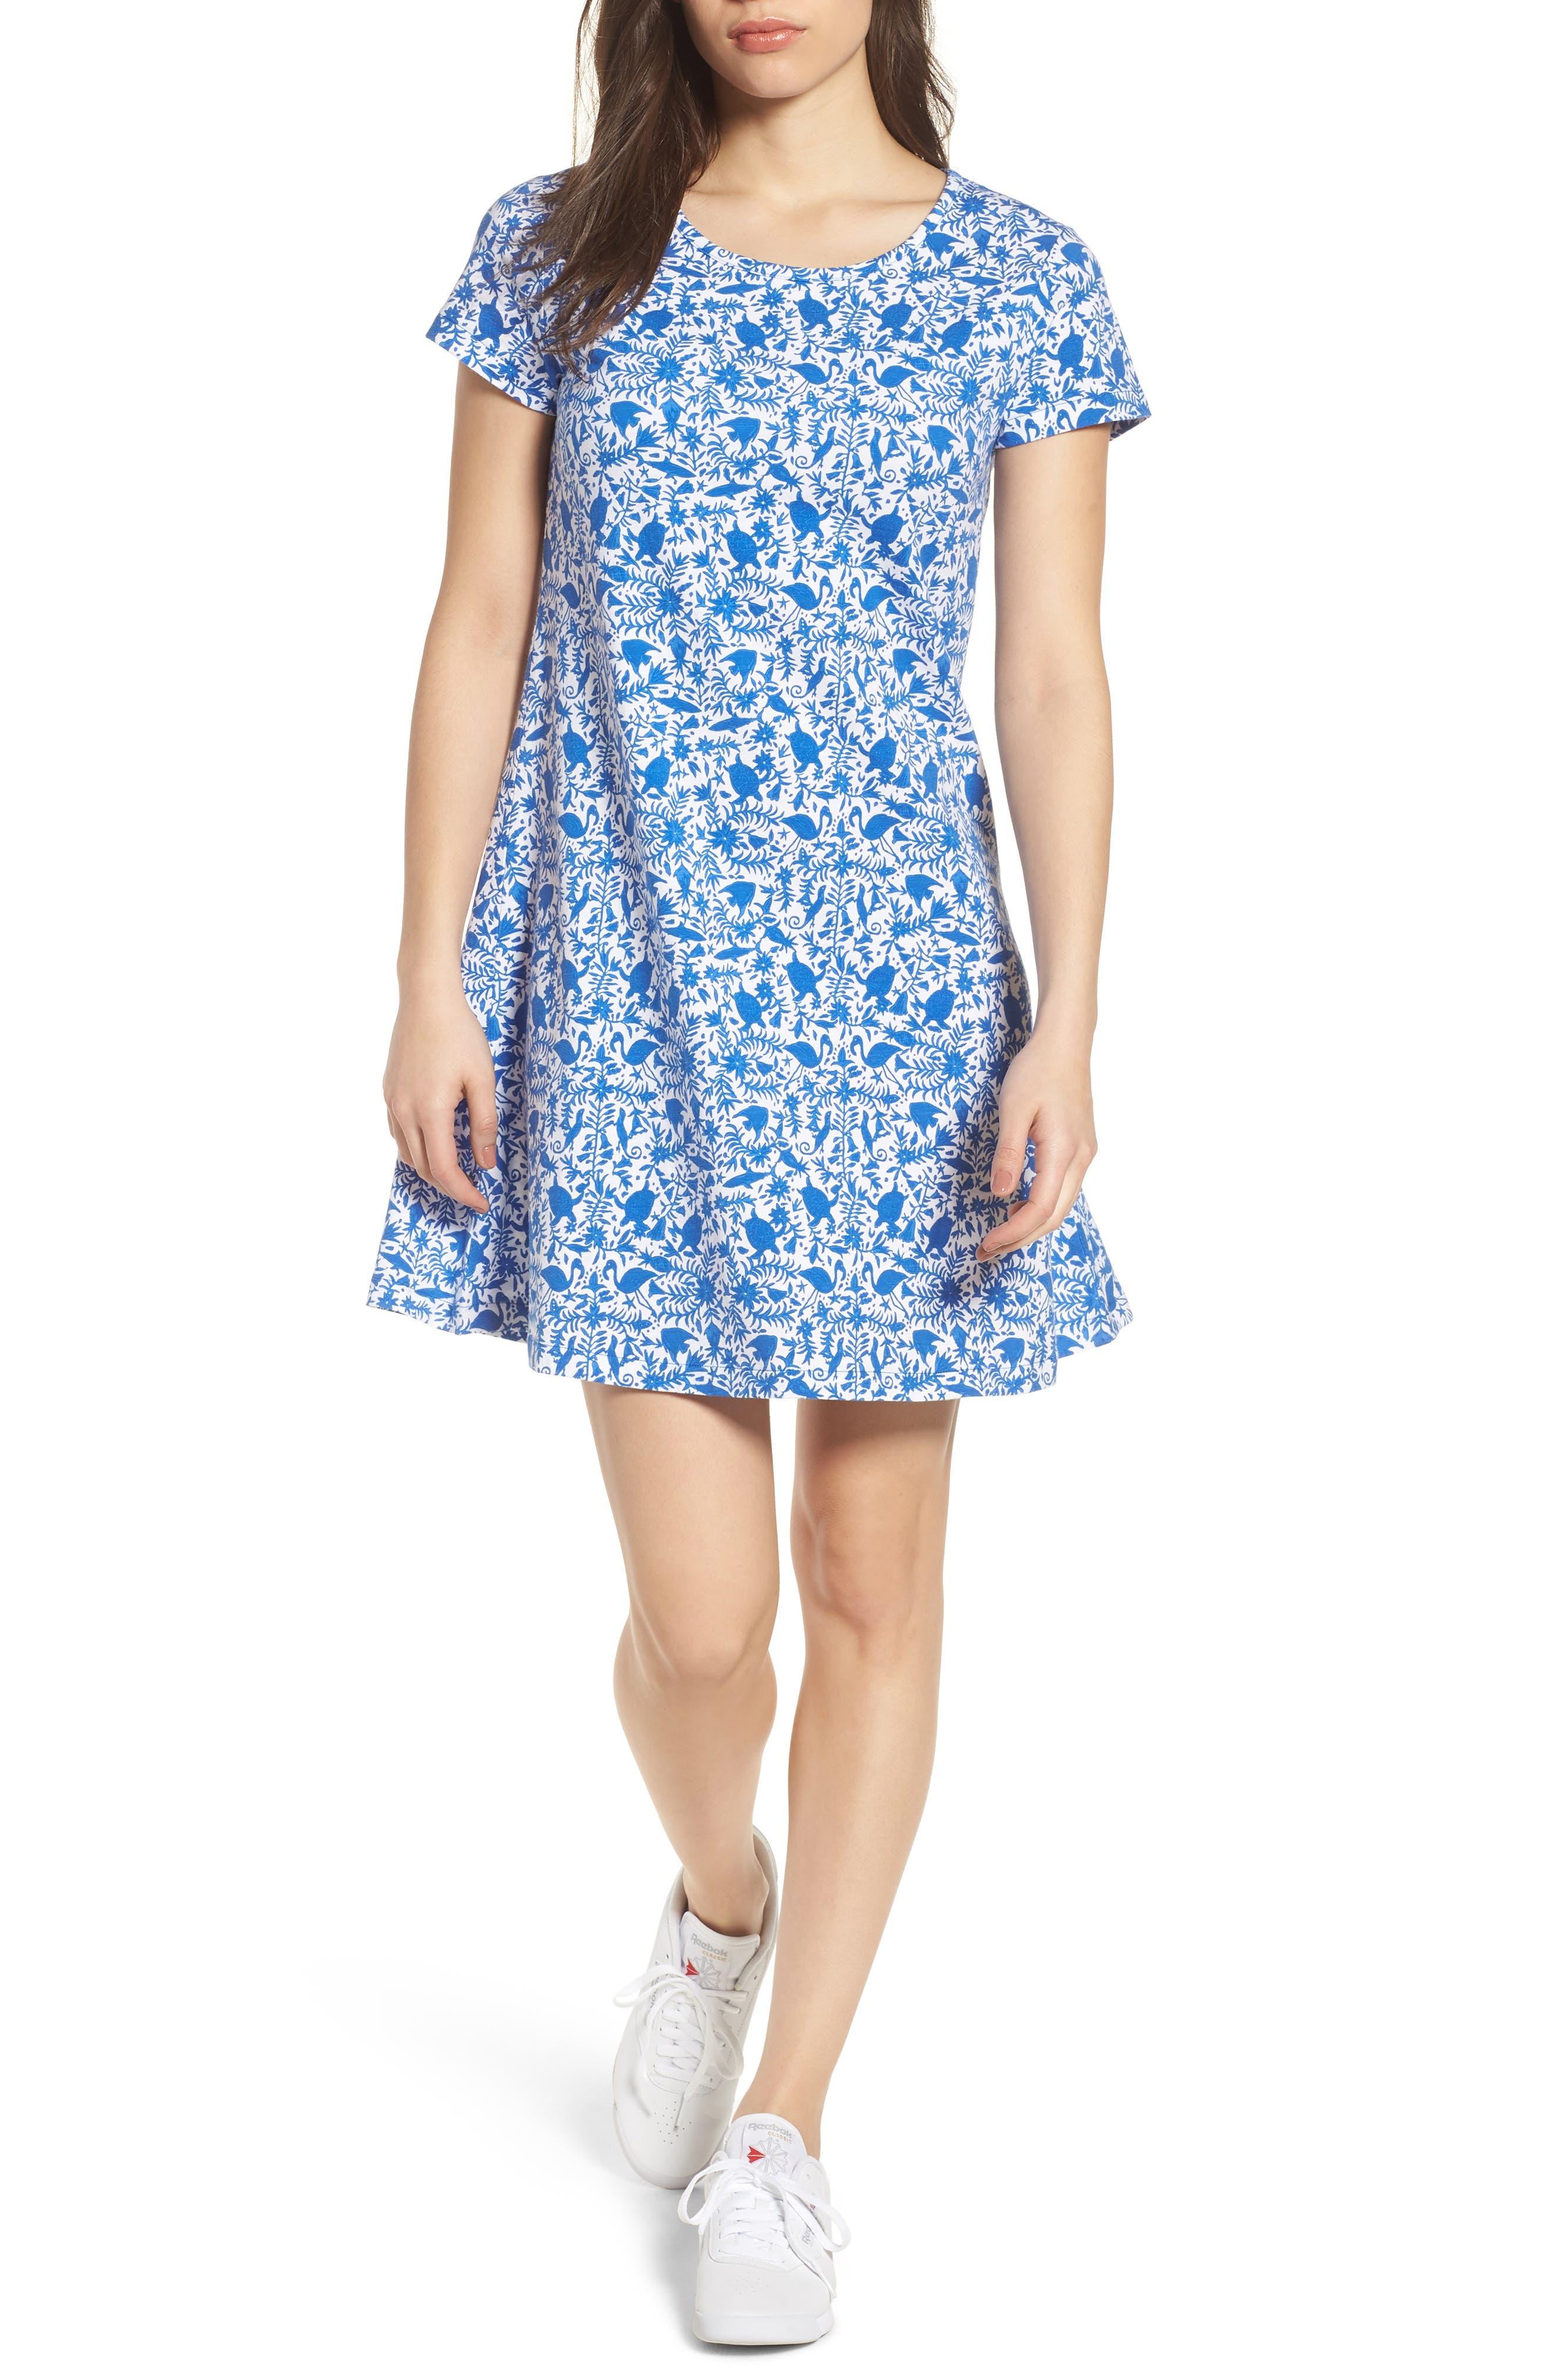 Bahamas Otomi Print Stretch Cotton Dress,                         Main,                         color, Yacht Blue